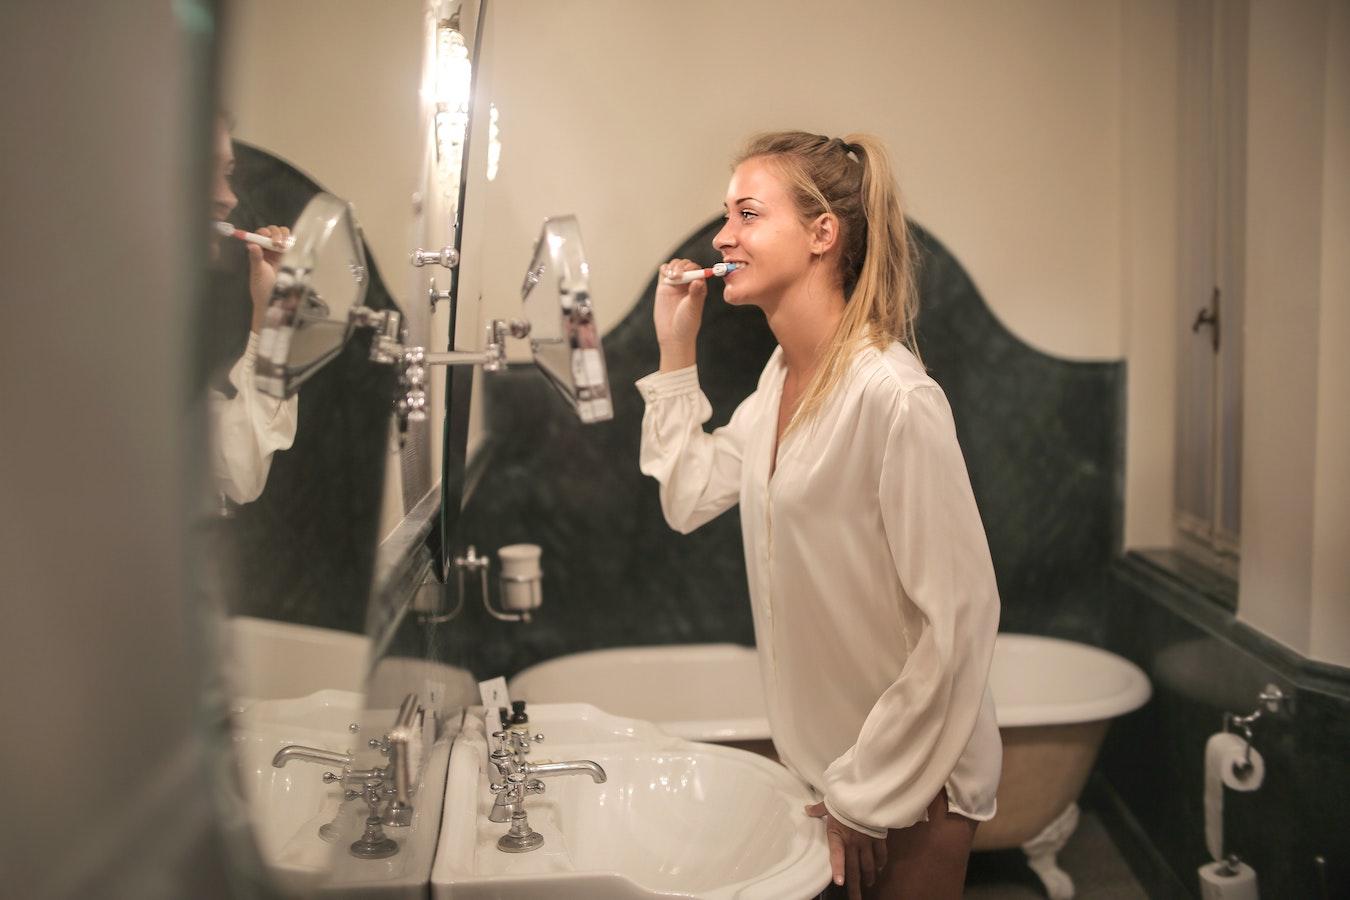 A woman brushing her teeth in the bathroom